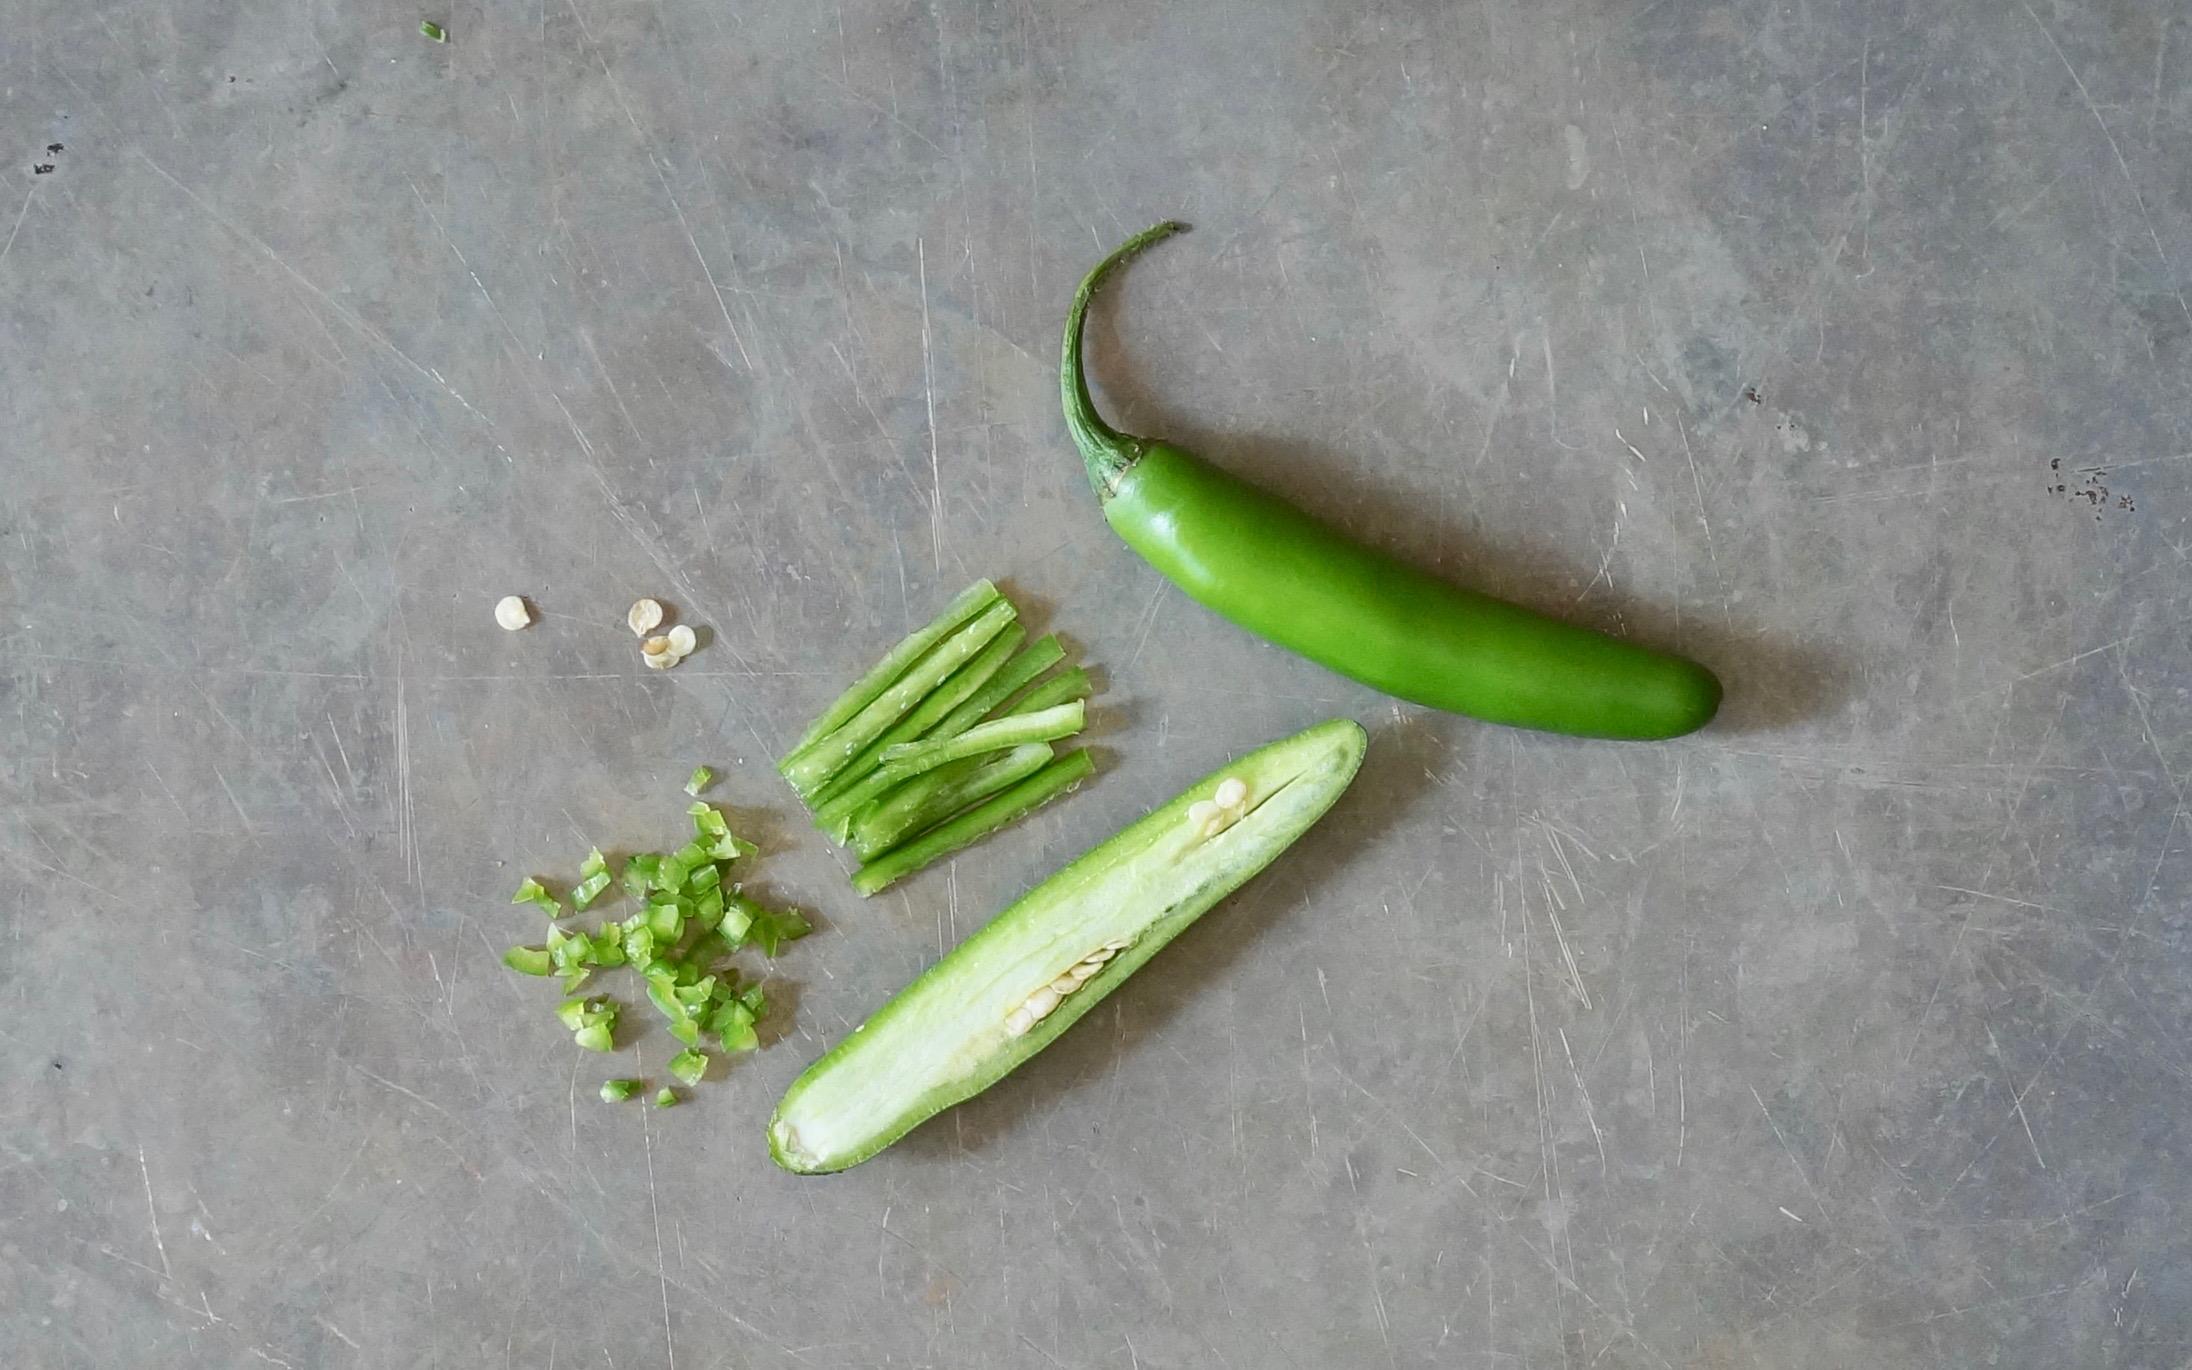 Authentic-Mexican-Recipes-Serrano-Peppers-Rebecca-Gordon-Editor-In-Chief-Buttermilk-Lipstick-Culinary-Lessons-RebeccaGordon-Southern-Hostess-Pastry-Chef-Birmingham-Alabama